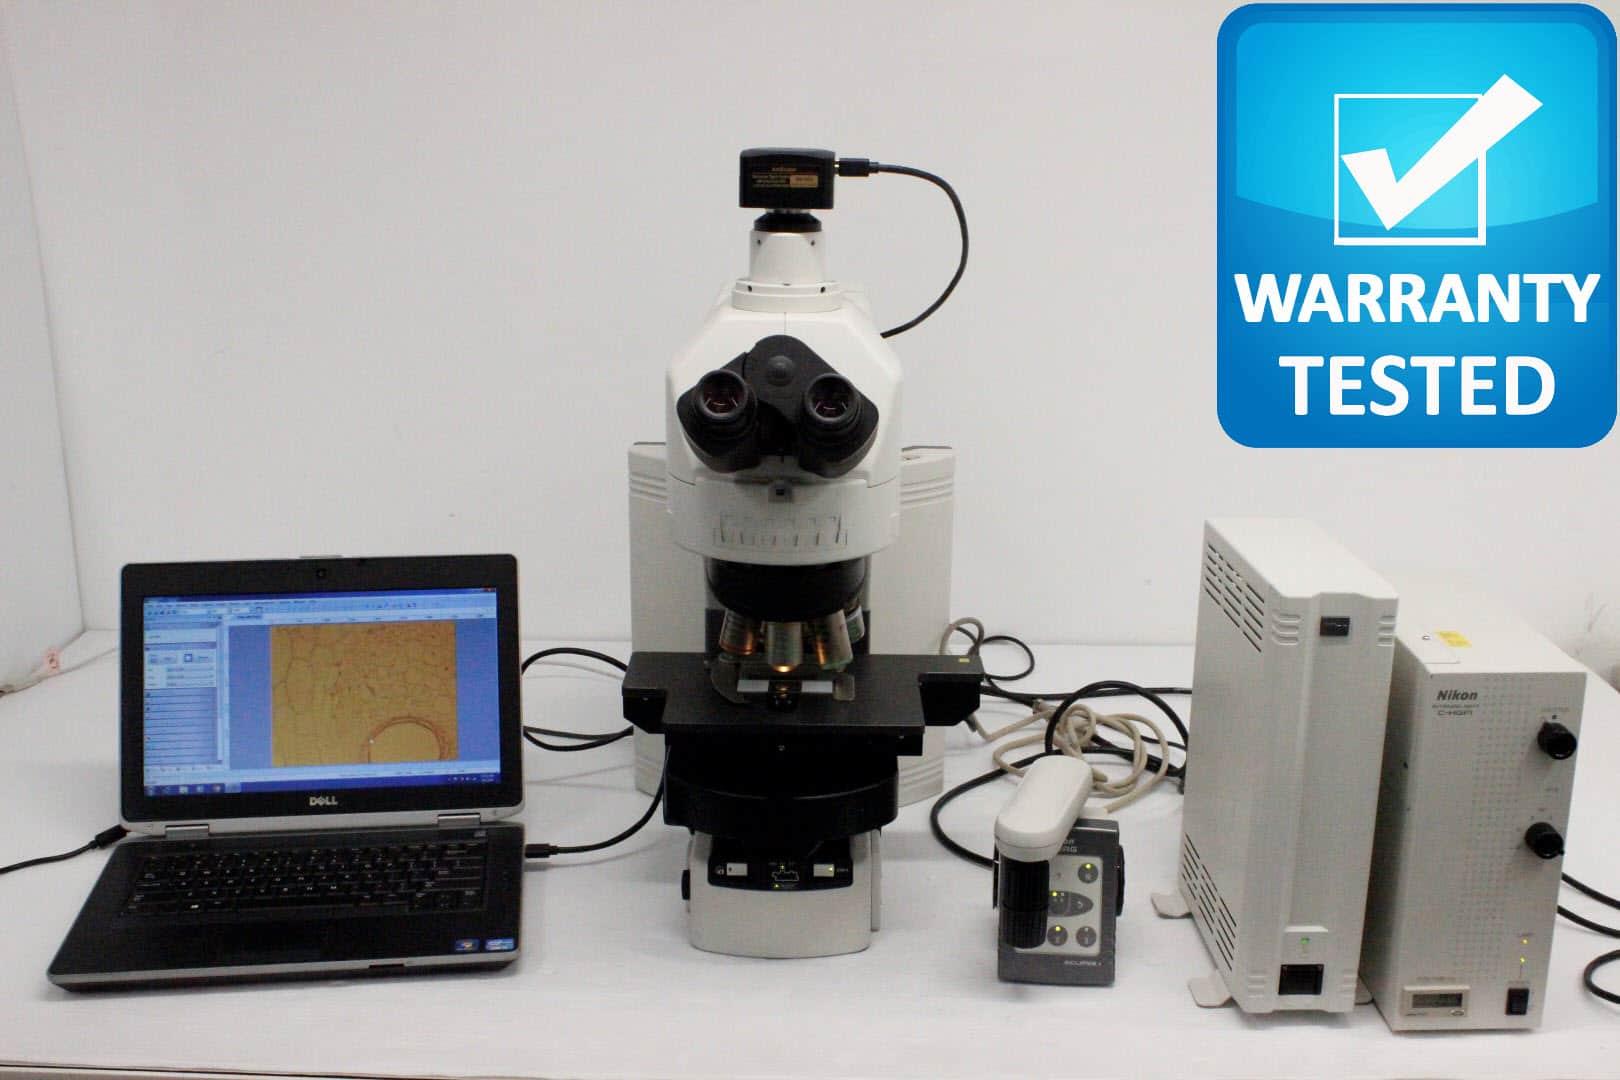 Nikon 90i Motorized Phase Contrast Fluorescence Microscope